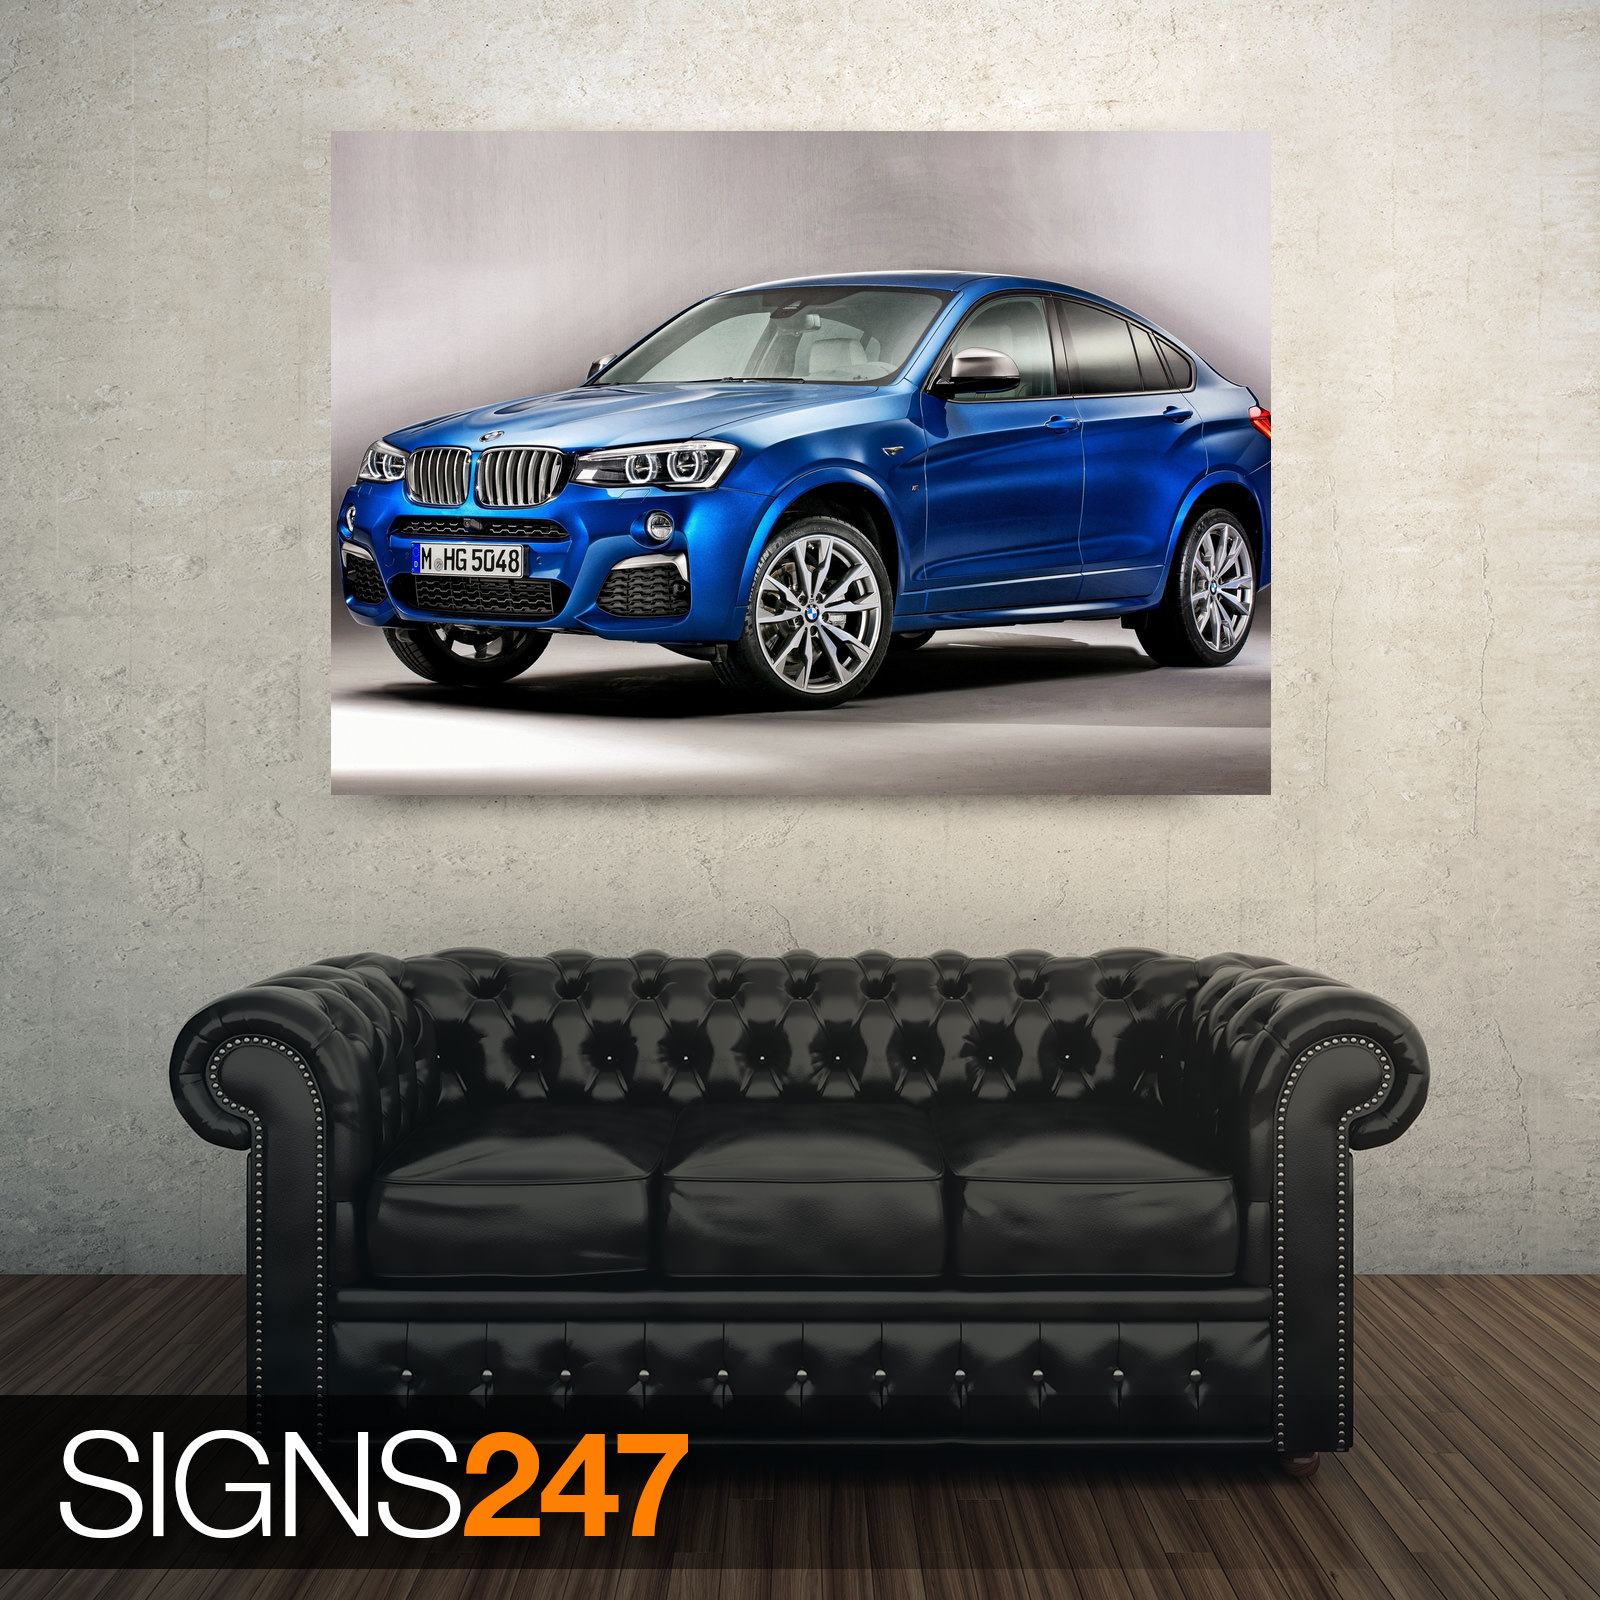 CAR POSTER AC552 BMW X4M BLUE Photo Picture Poster Print Art A0 A1 A2 A3 A4